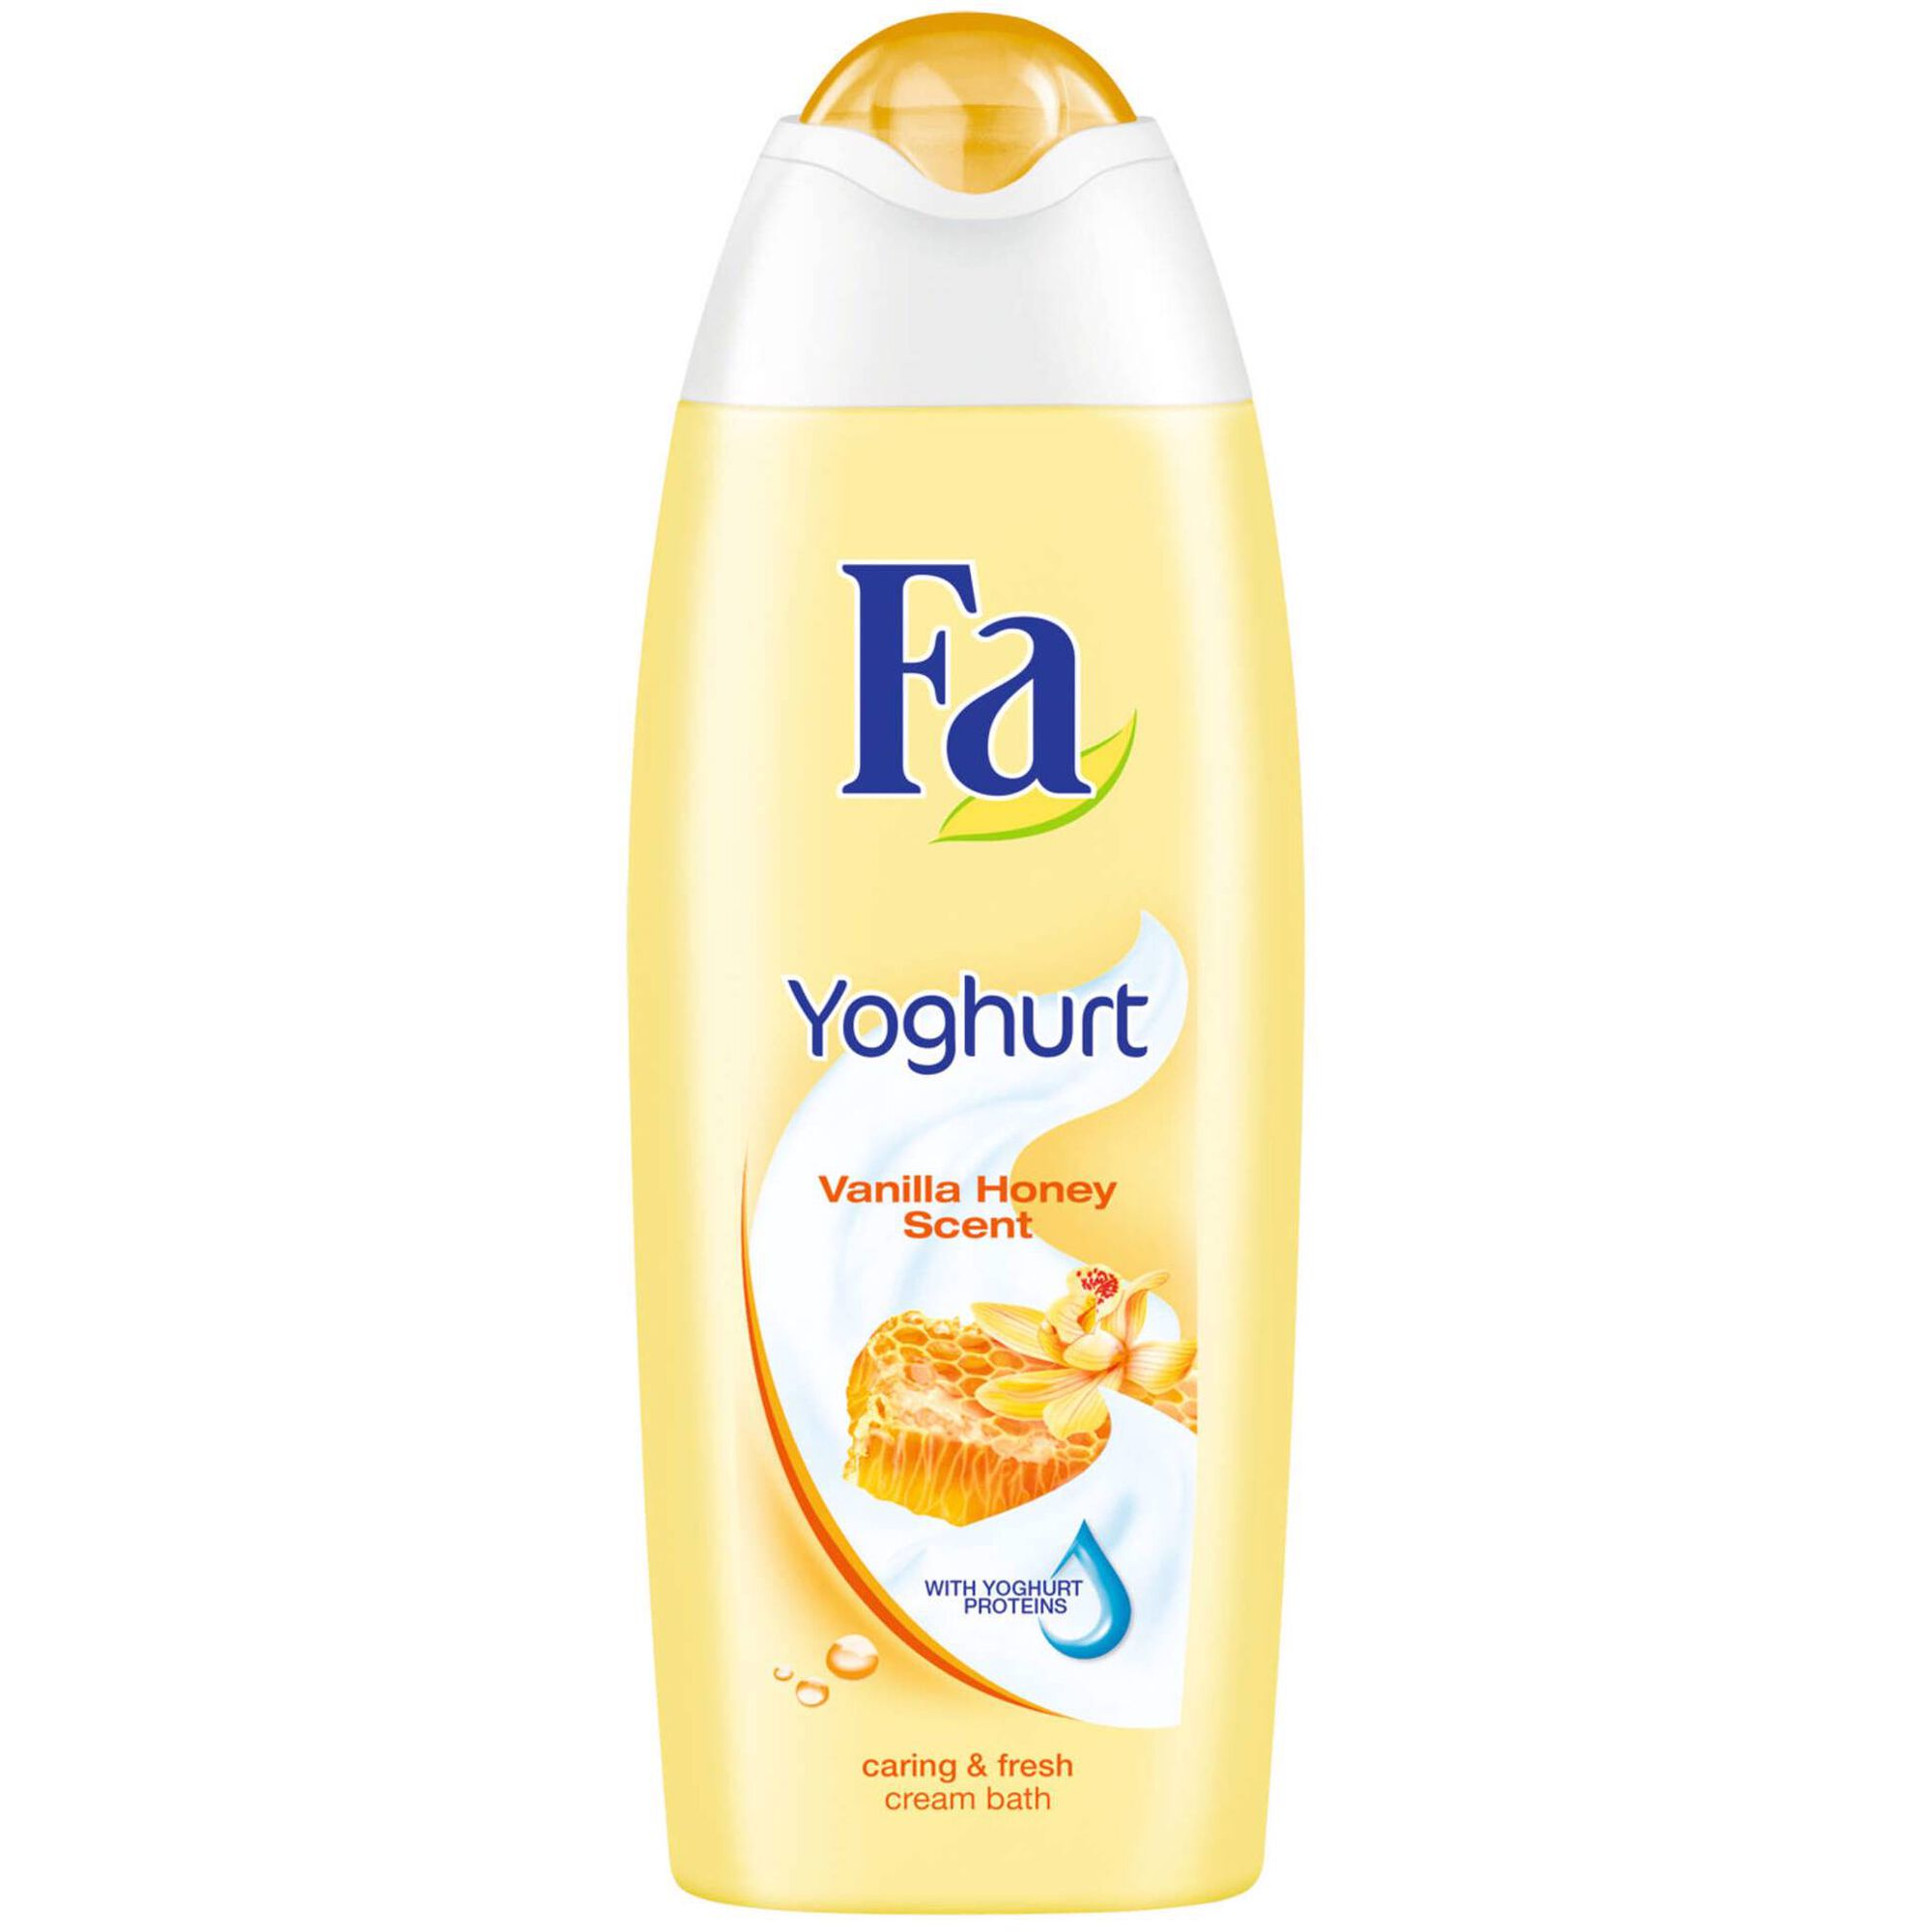 Gel de Banho Yoghurt